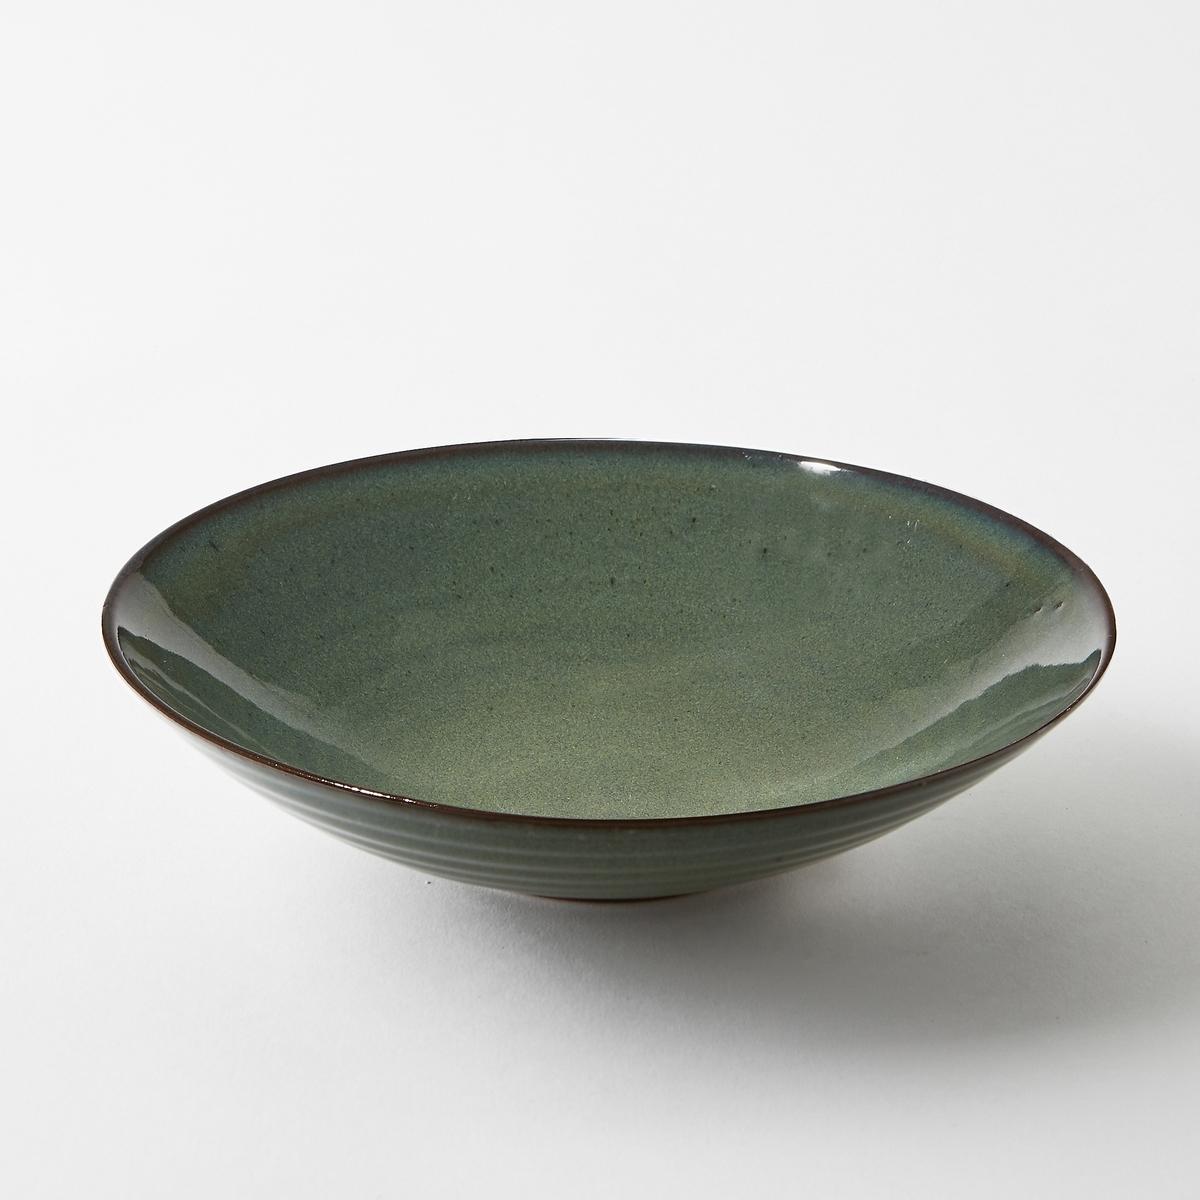 Тарелка глубокая из керамики, диаметр 23 см, Aqua от Serax тарелка глубокая из керамики диаметр 21 см banoka